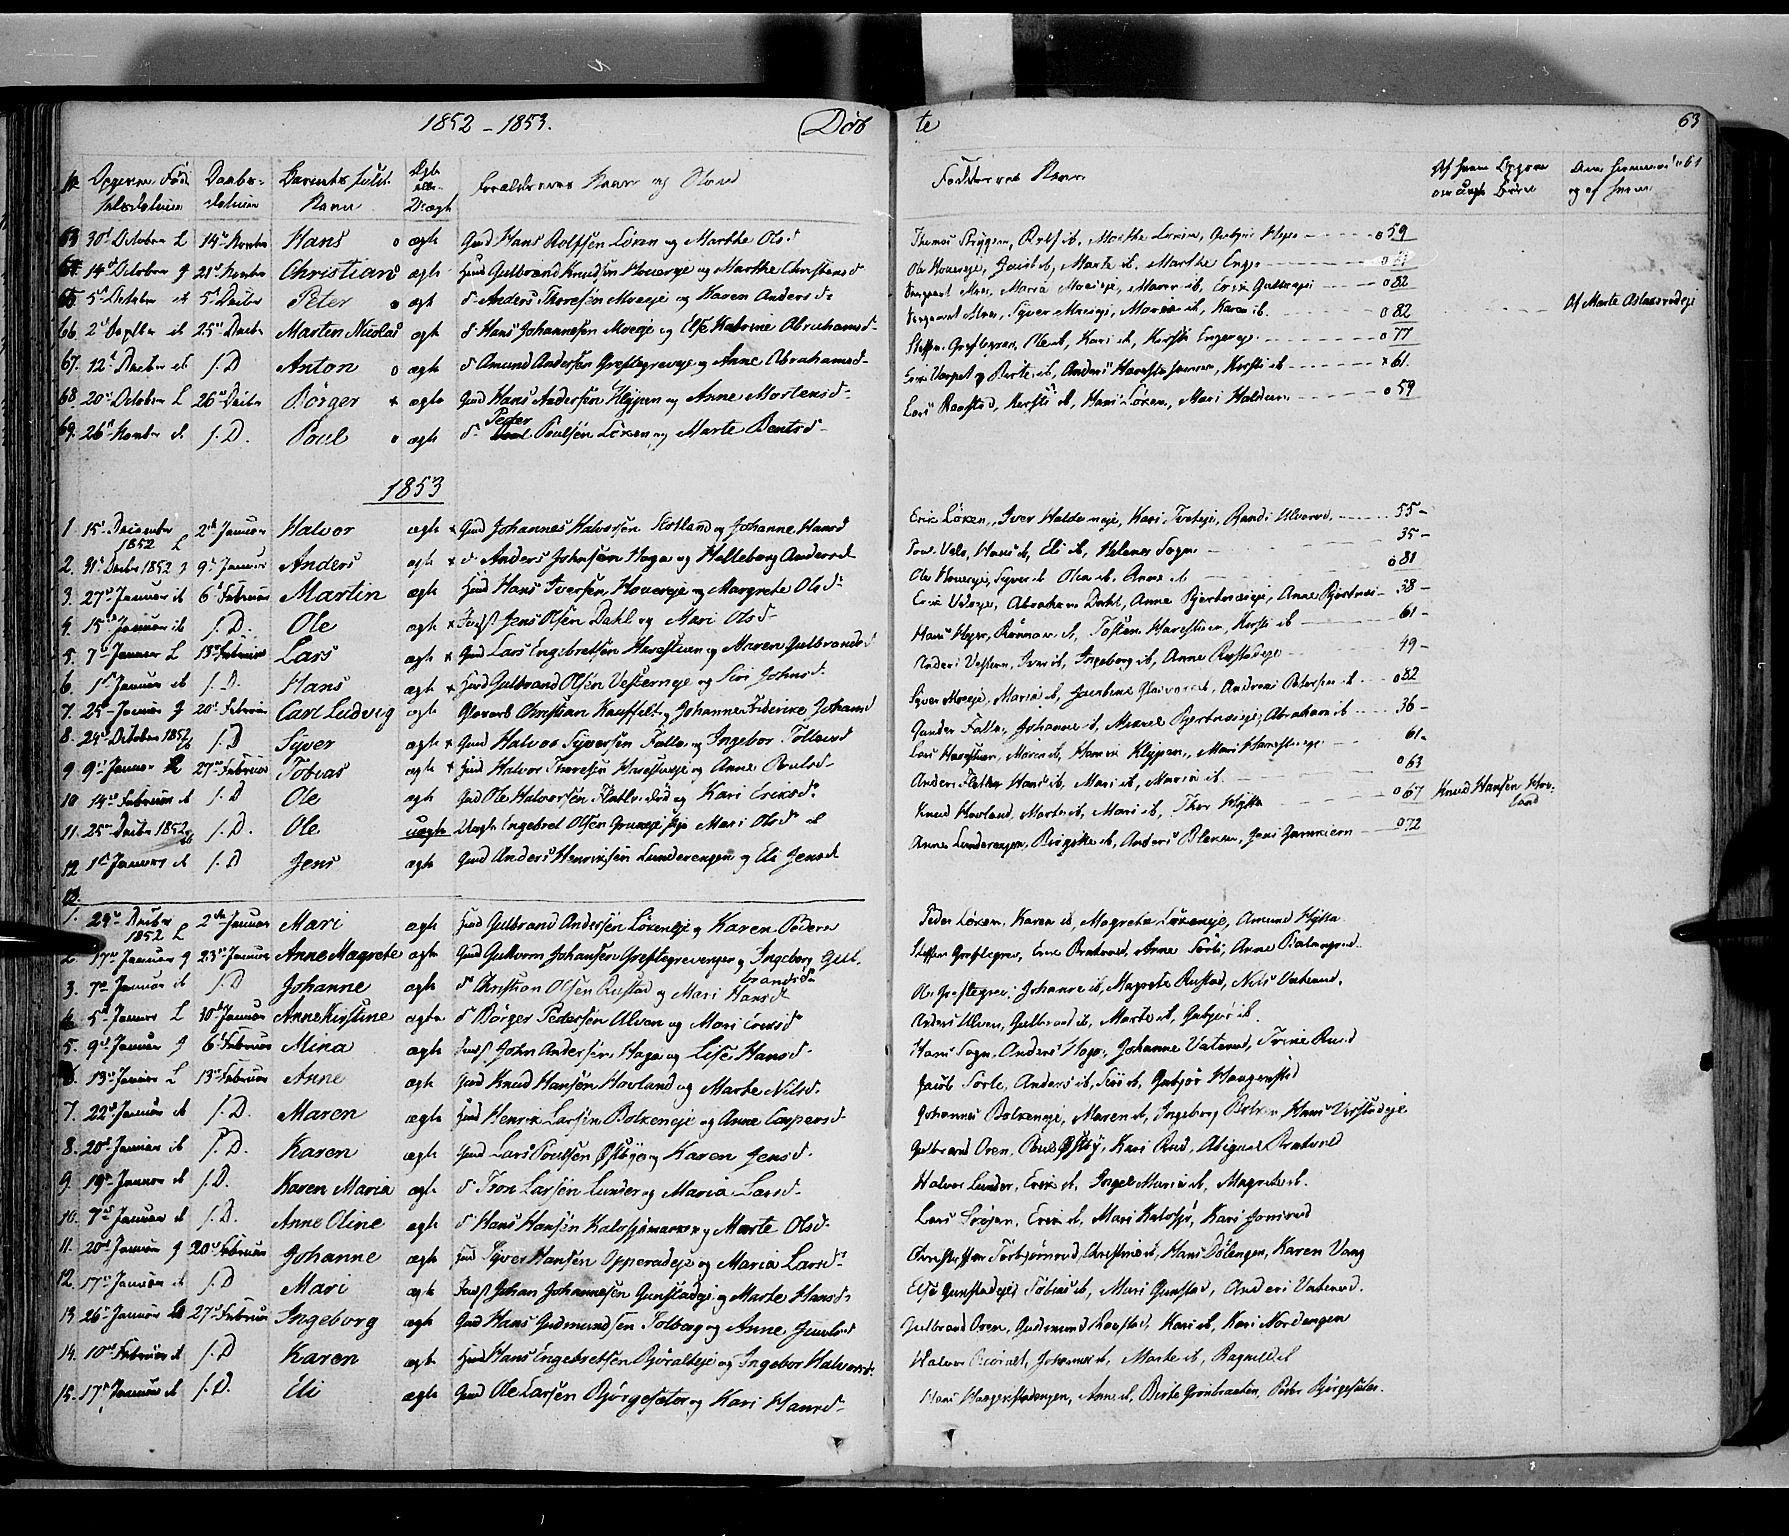 SAH, Jevnaker prestekontor, Ministerialbok nr. 6, 1837-1857, s. 63